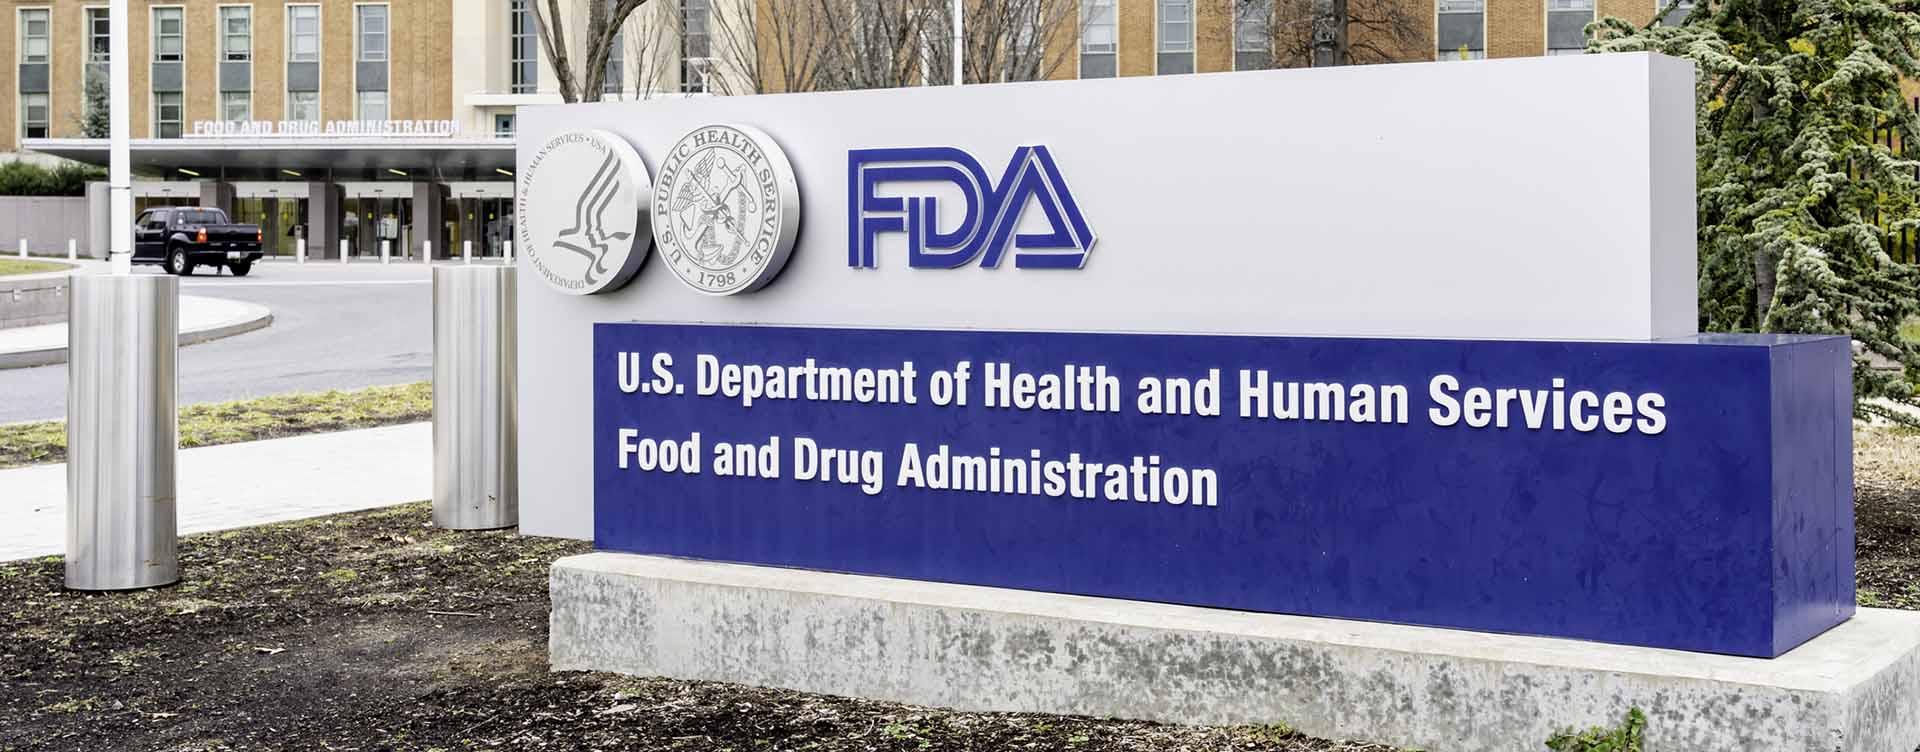 Hartford HealthCare Stops J&J Vaccines Following Federal Health Agency Concerns